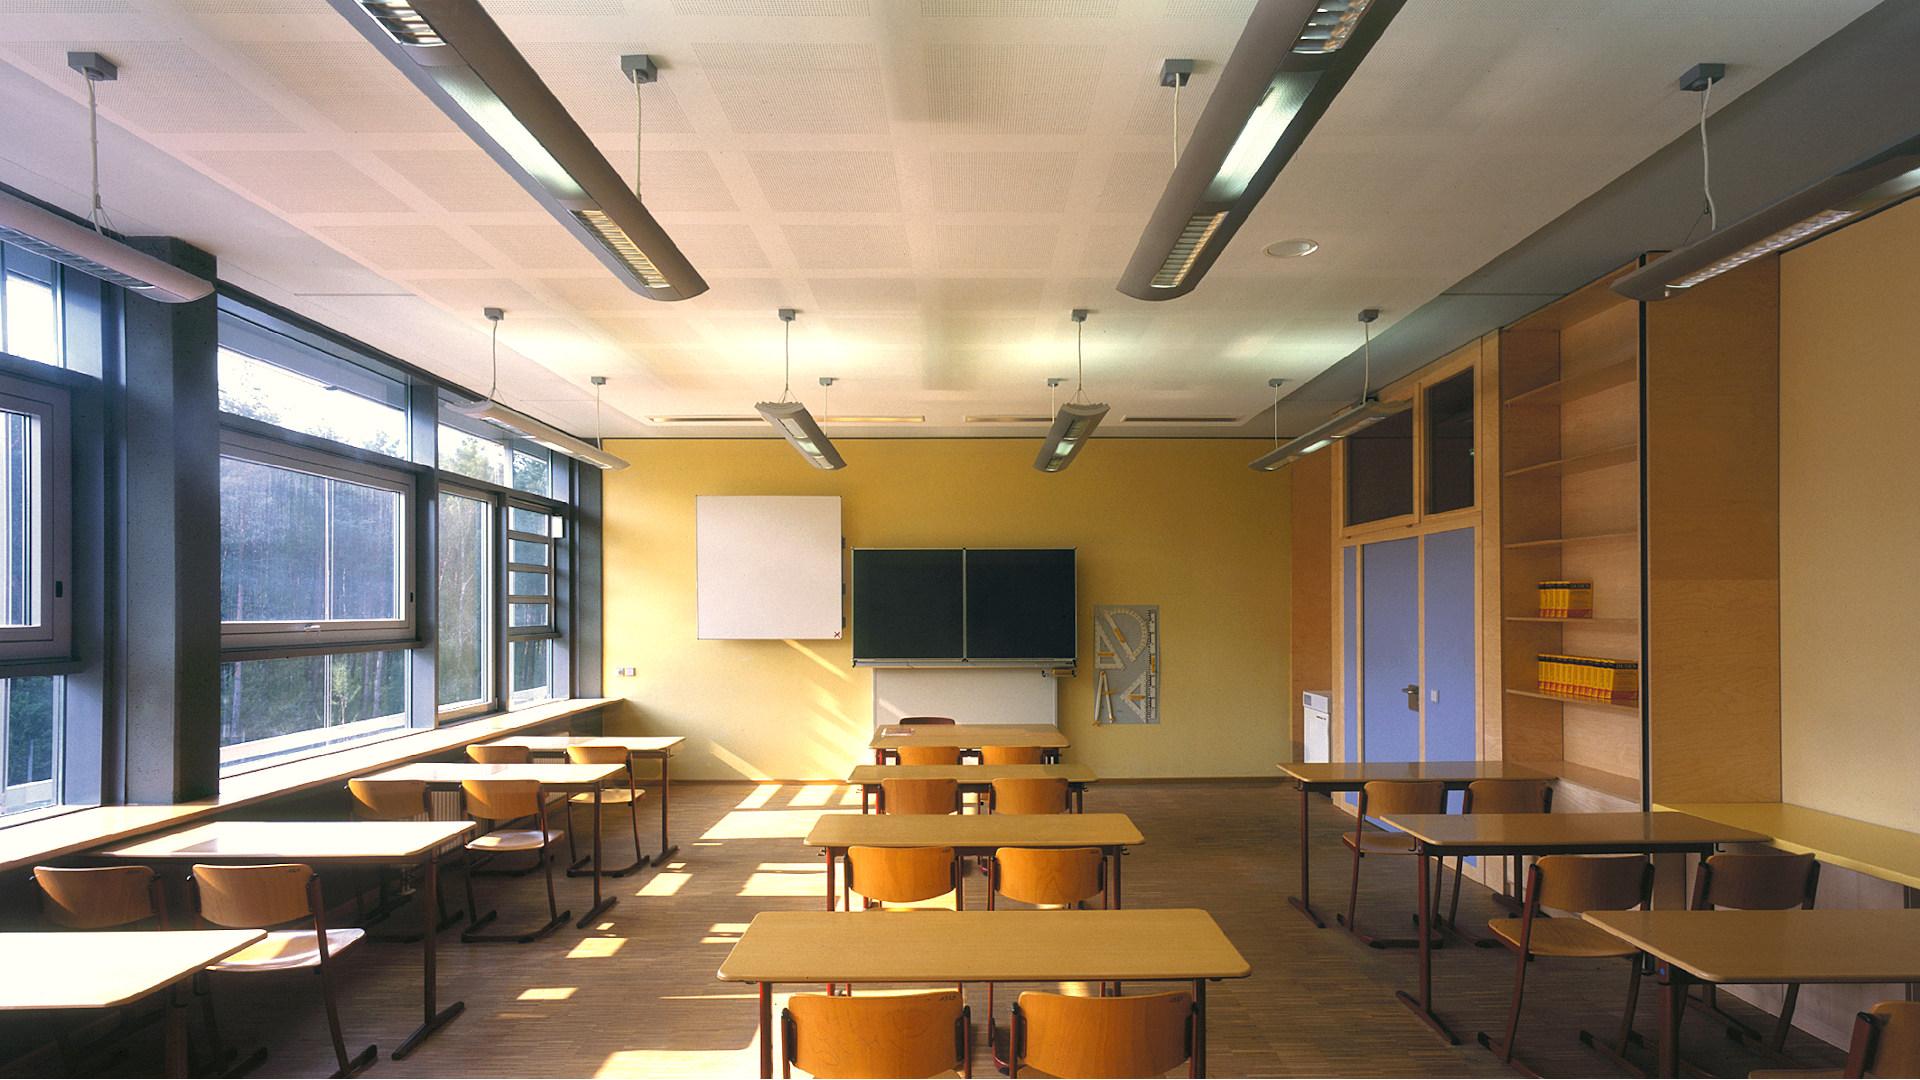 07-barnim-gymnasium-innen-w